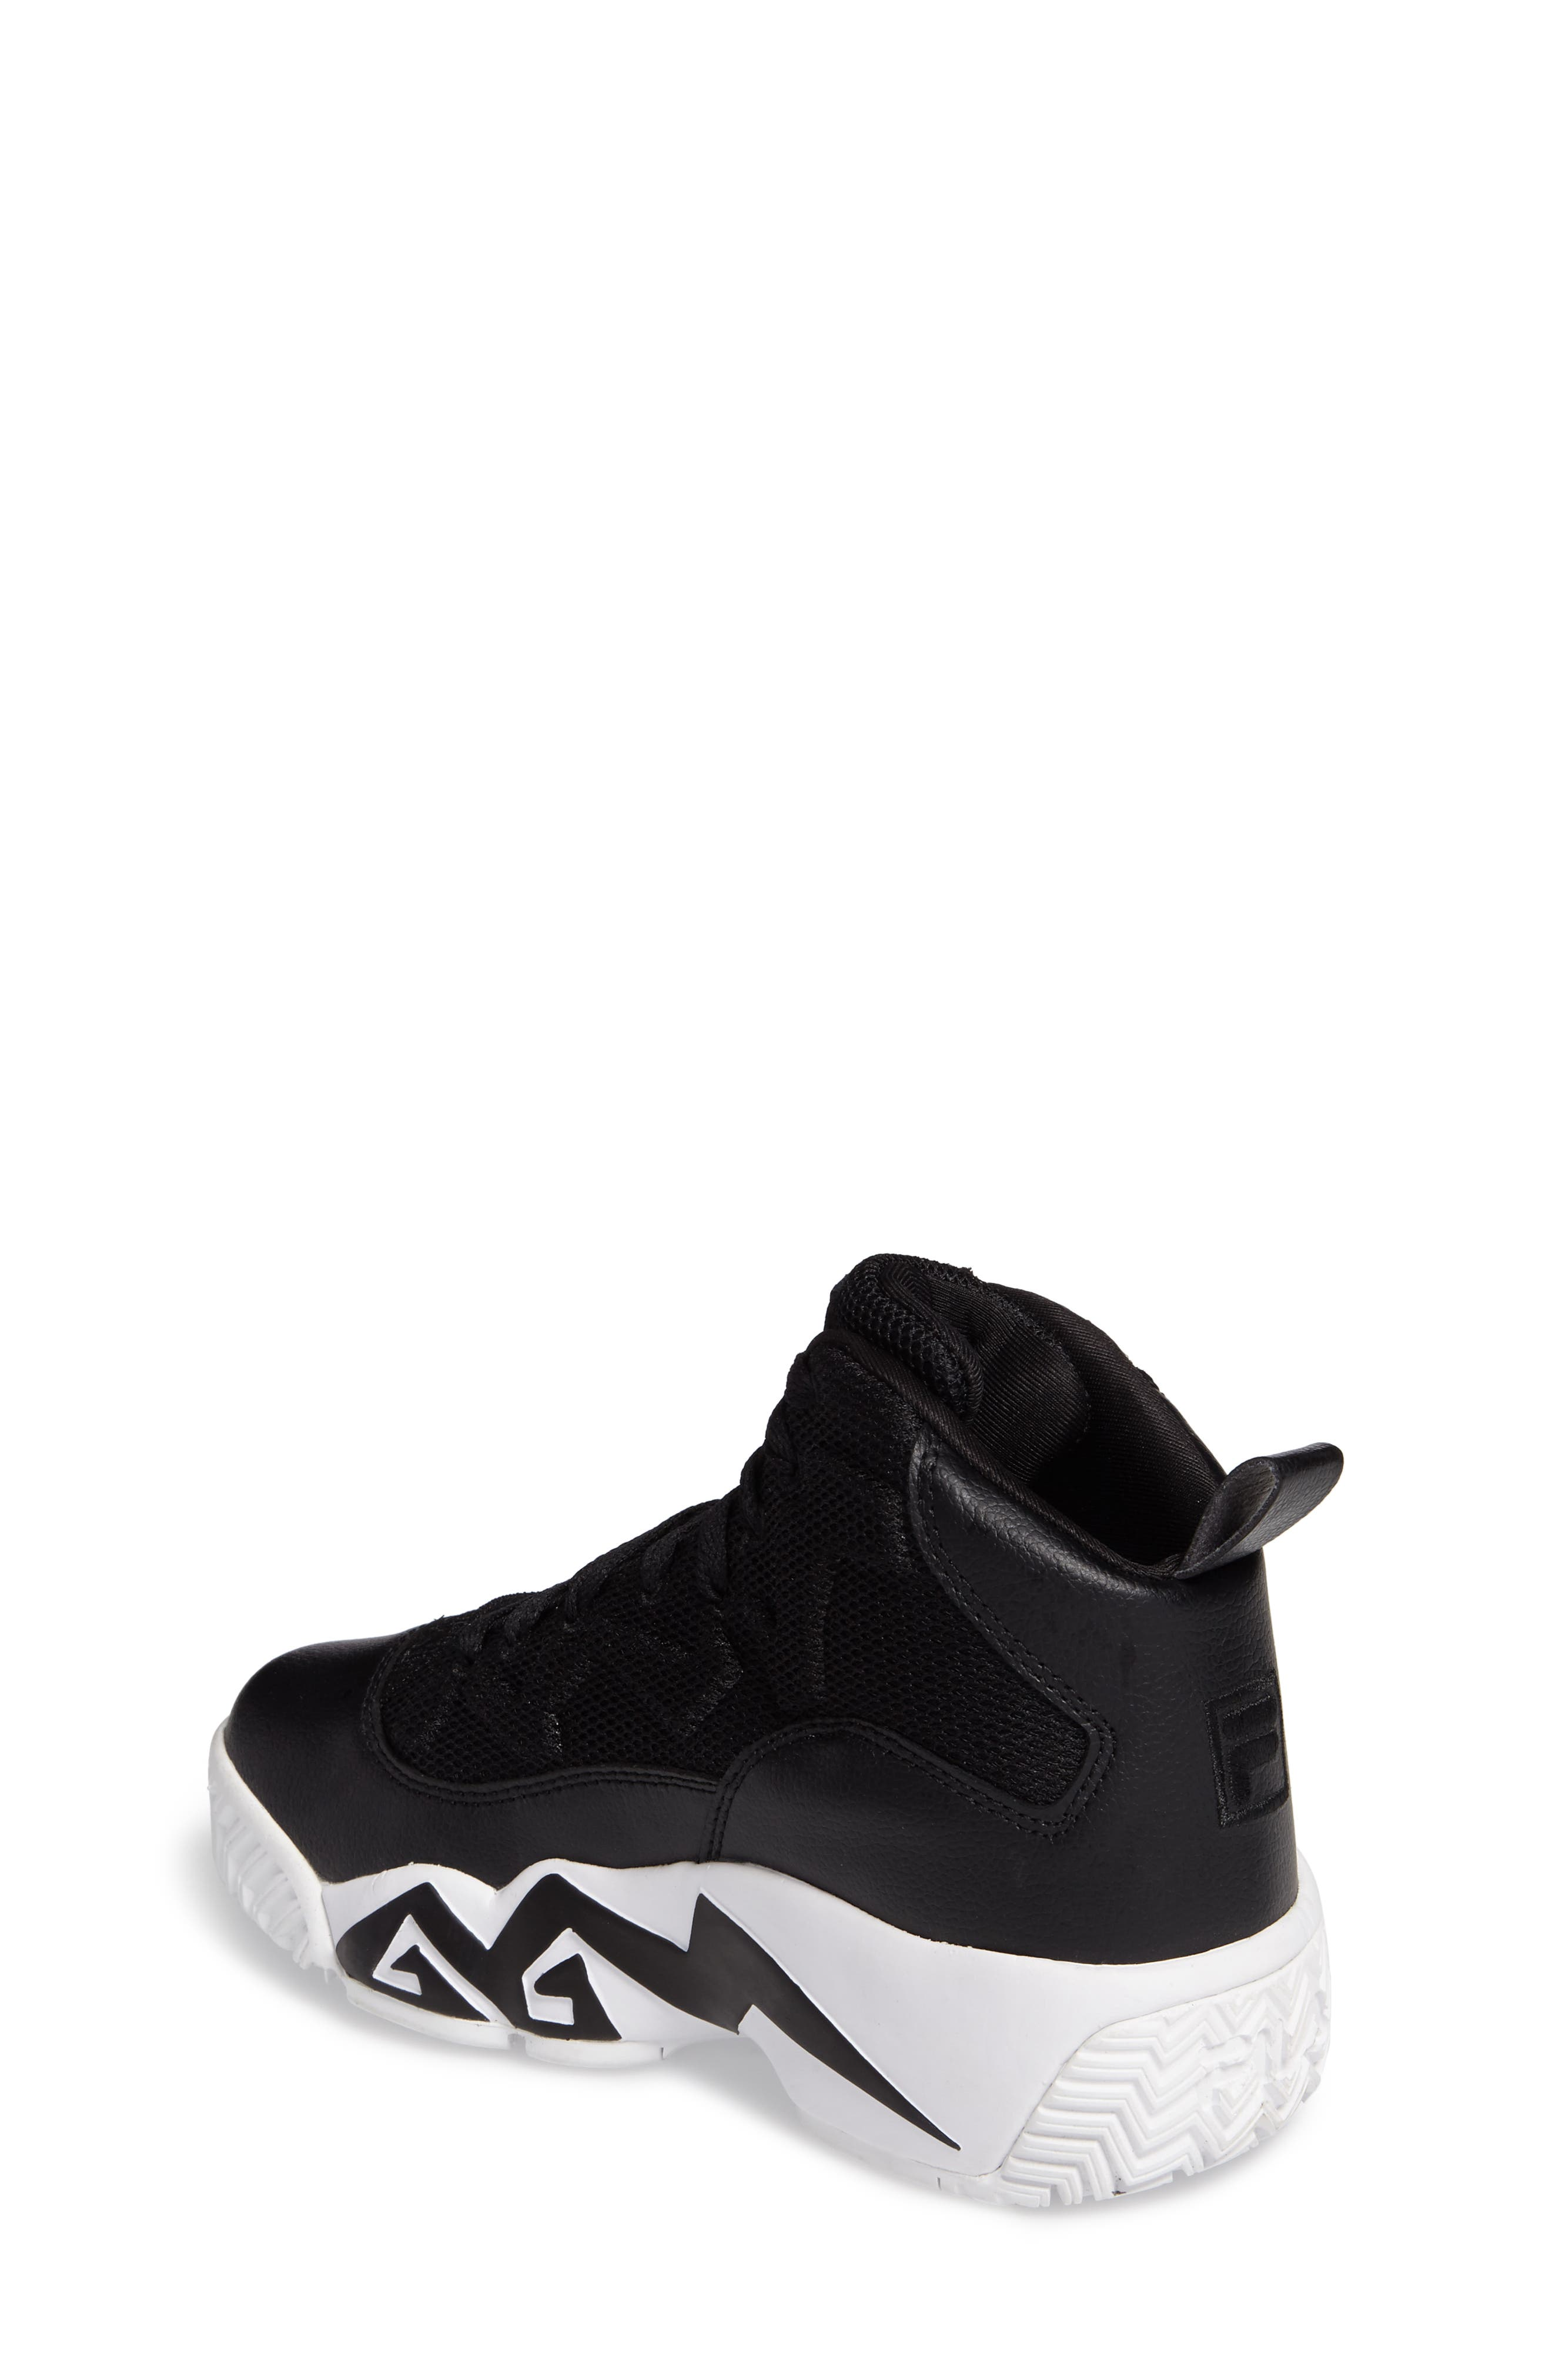 MB Mesh Sneaker,                             Alternate thumbnail 2, color,                             016